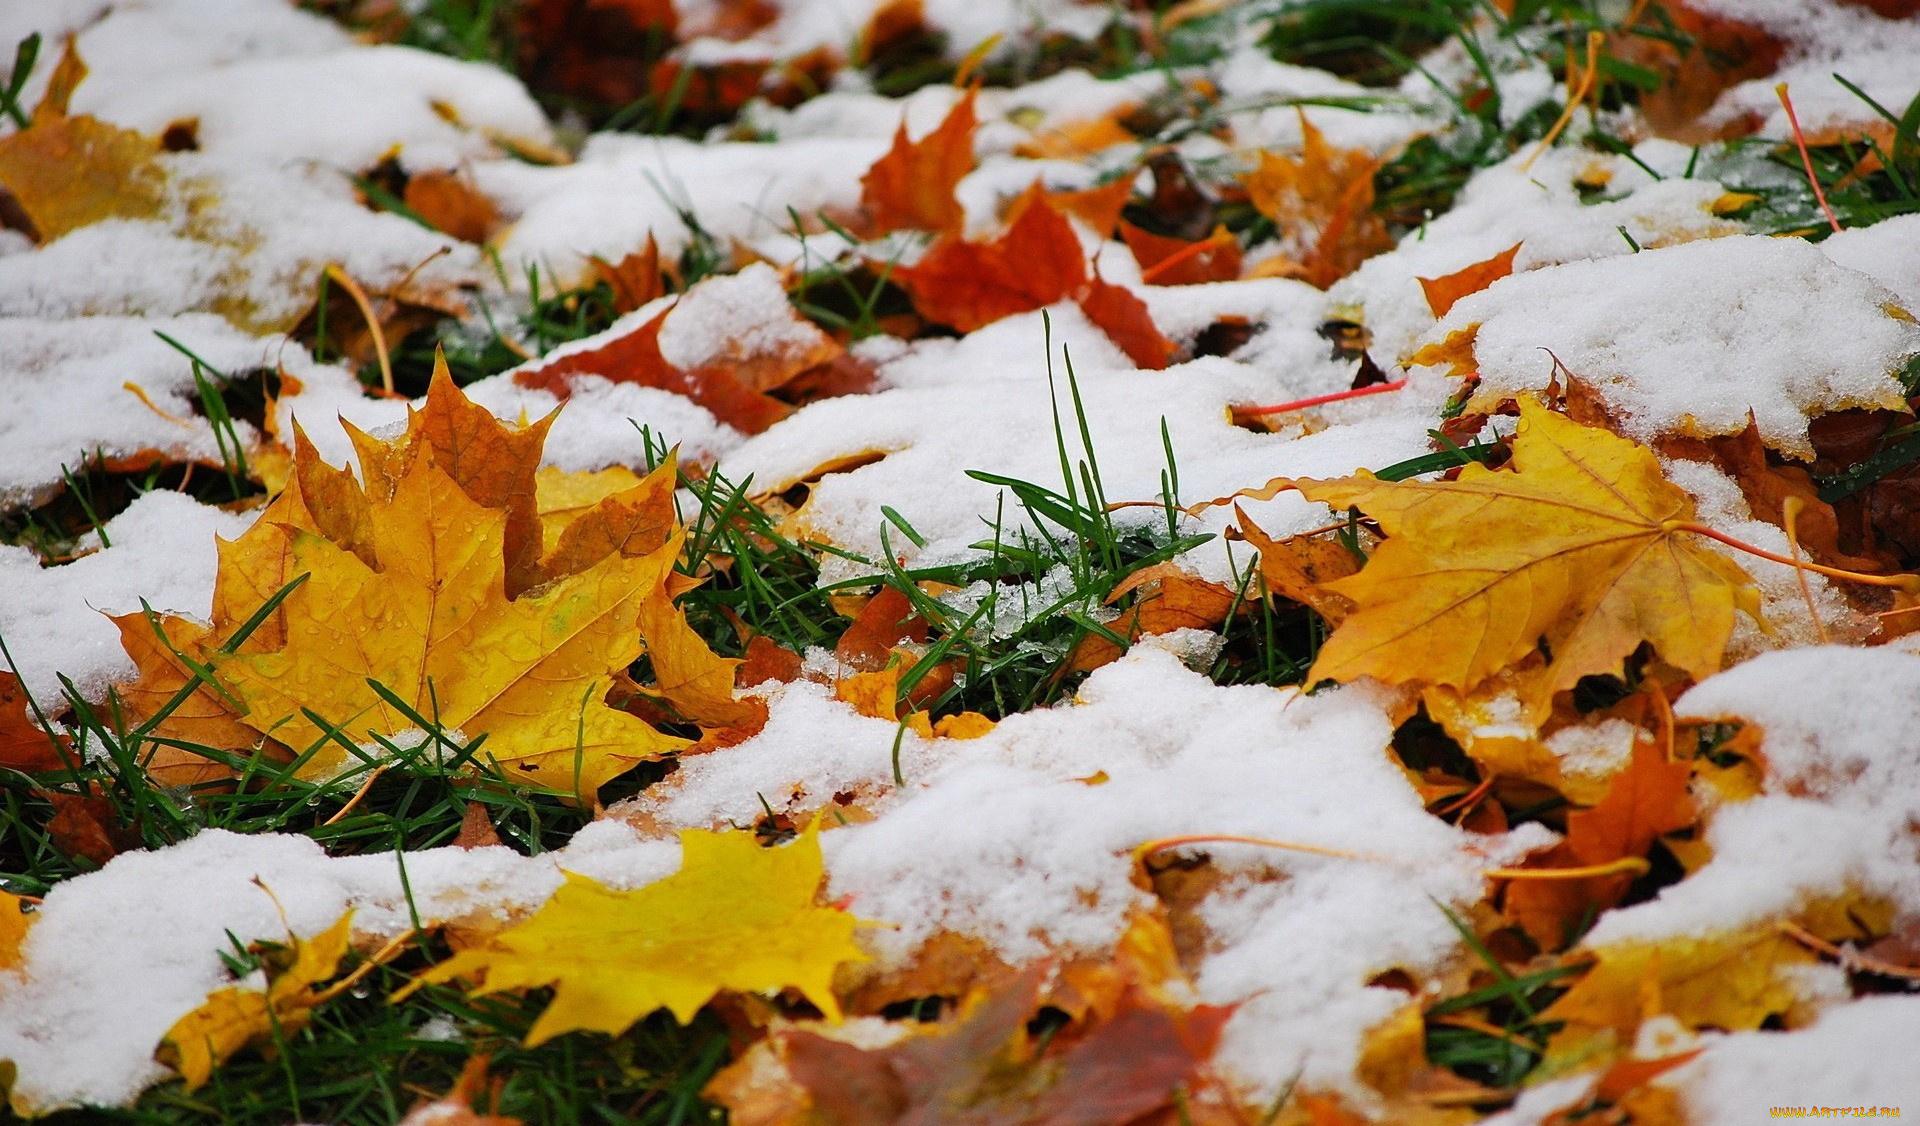 priroda-listya-trava-sneg-876704.jpg